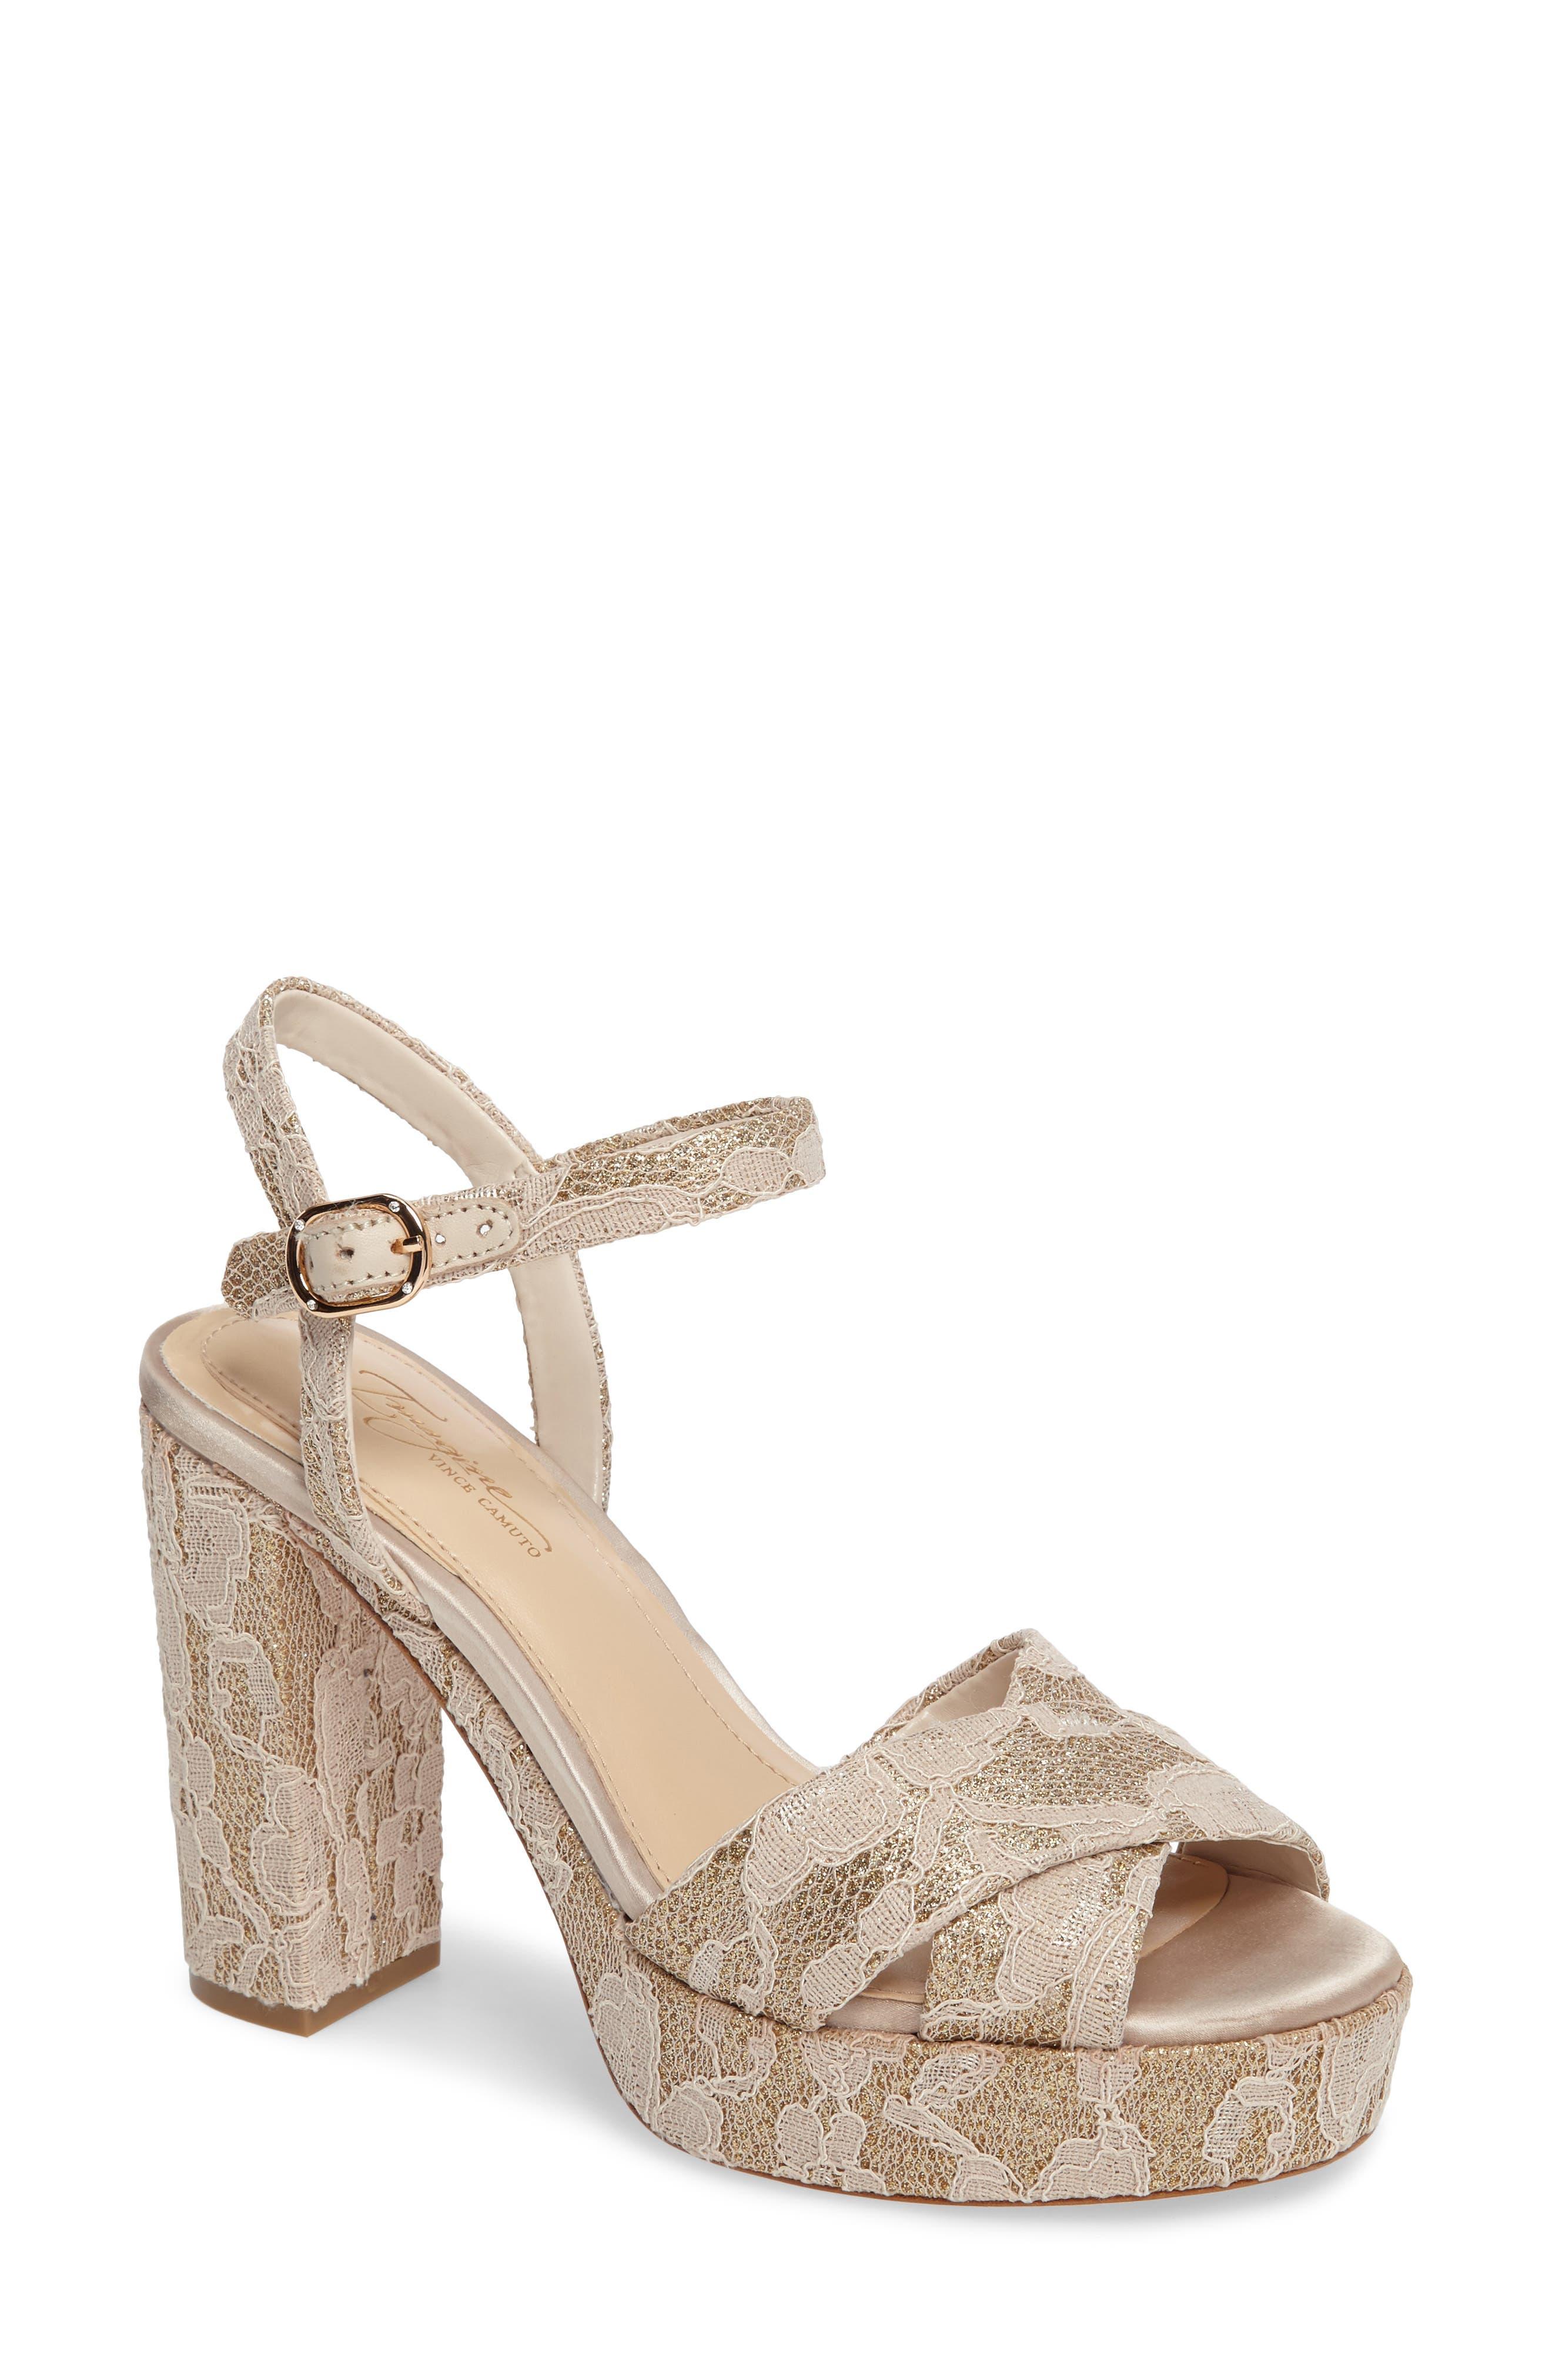 Alternate Image 1 Selected - Imagine by Vince Camuto 'Valora' Platform Sandal (Women)